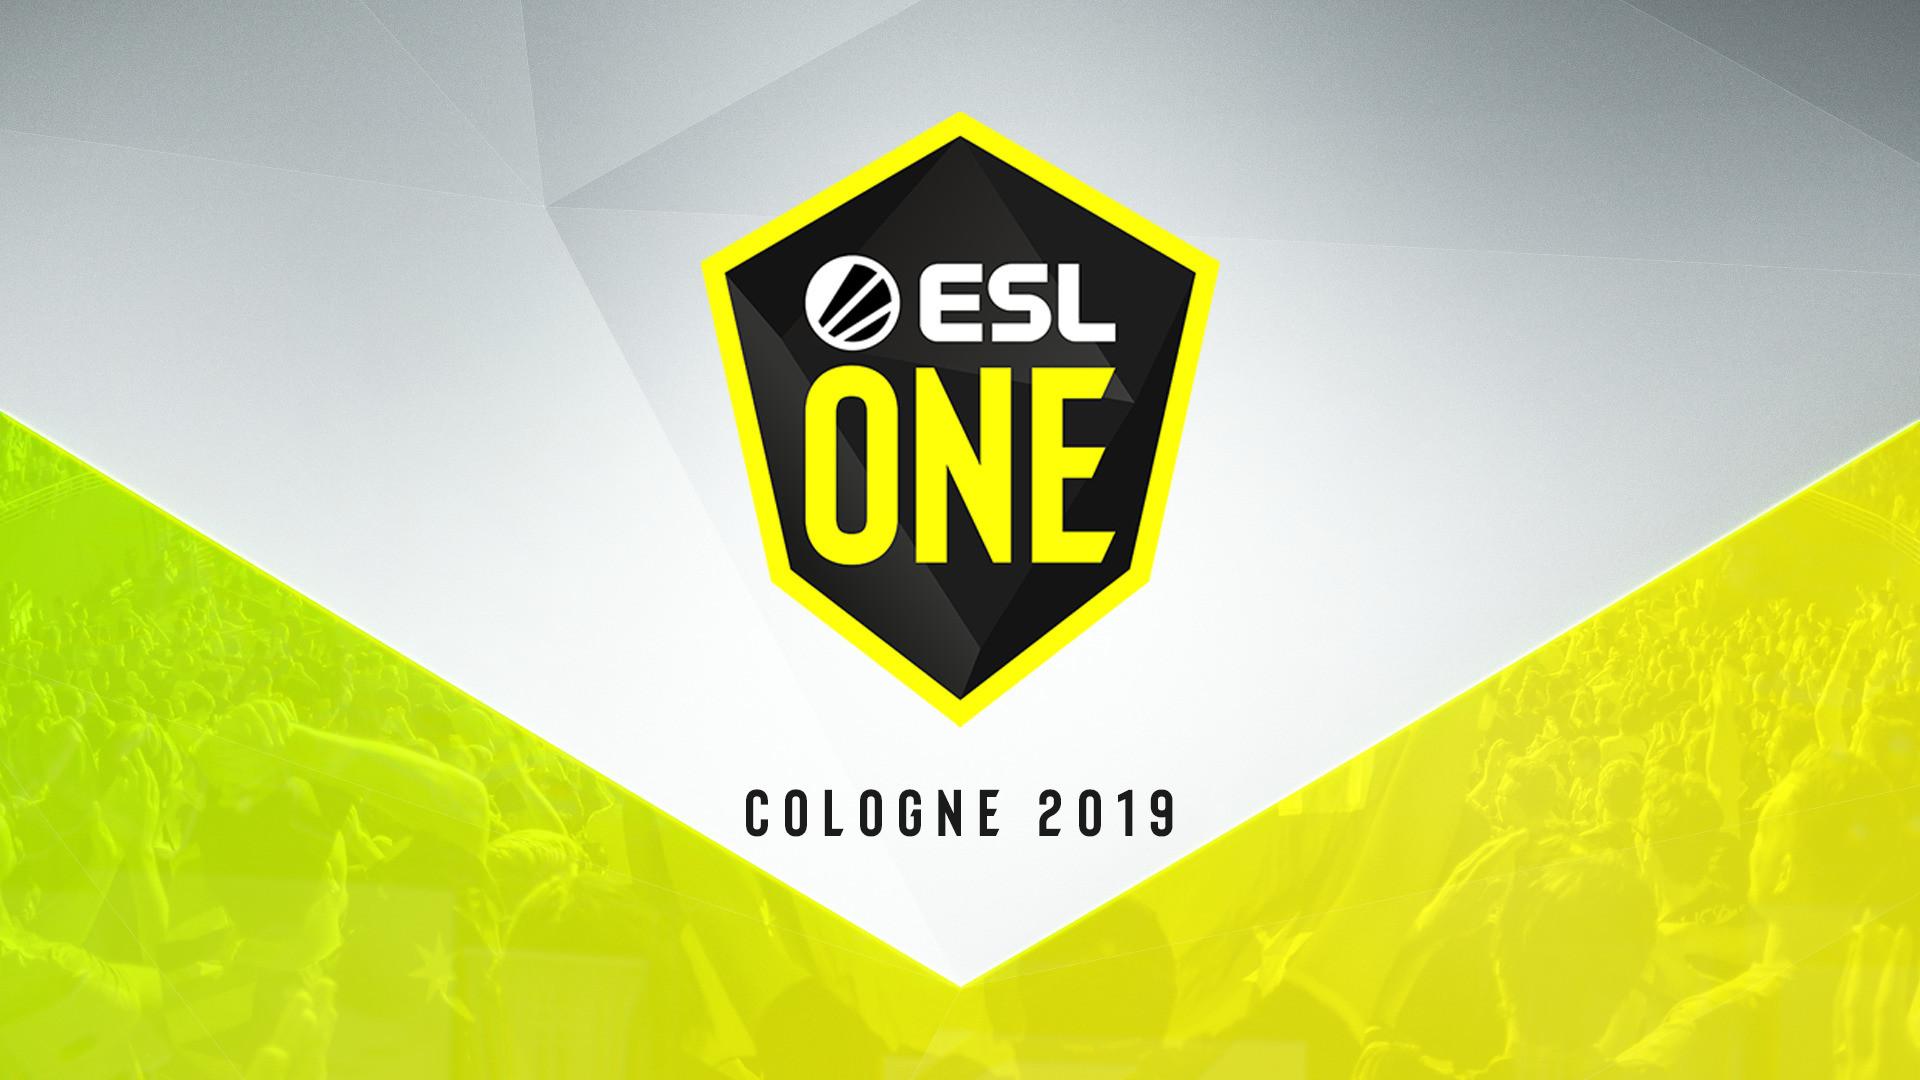 ESL One Cologne 2019 : La preview